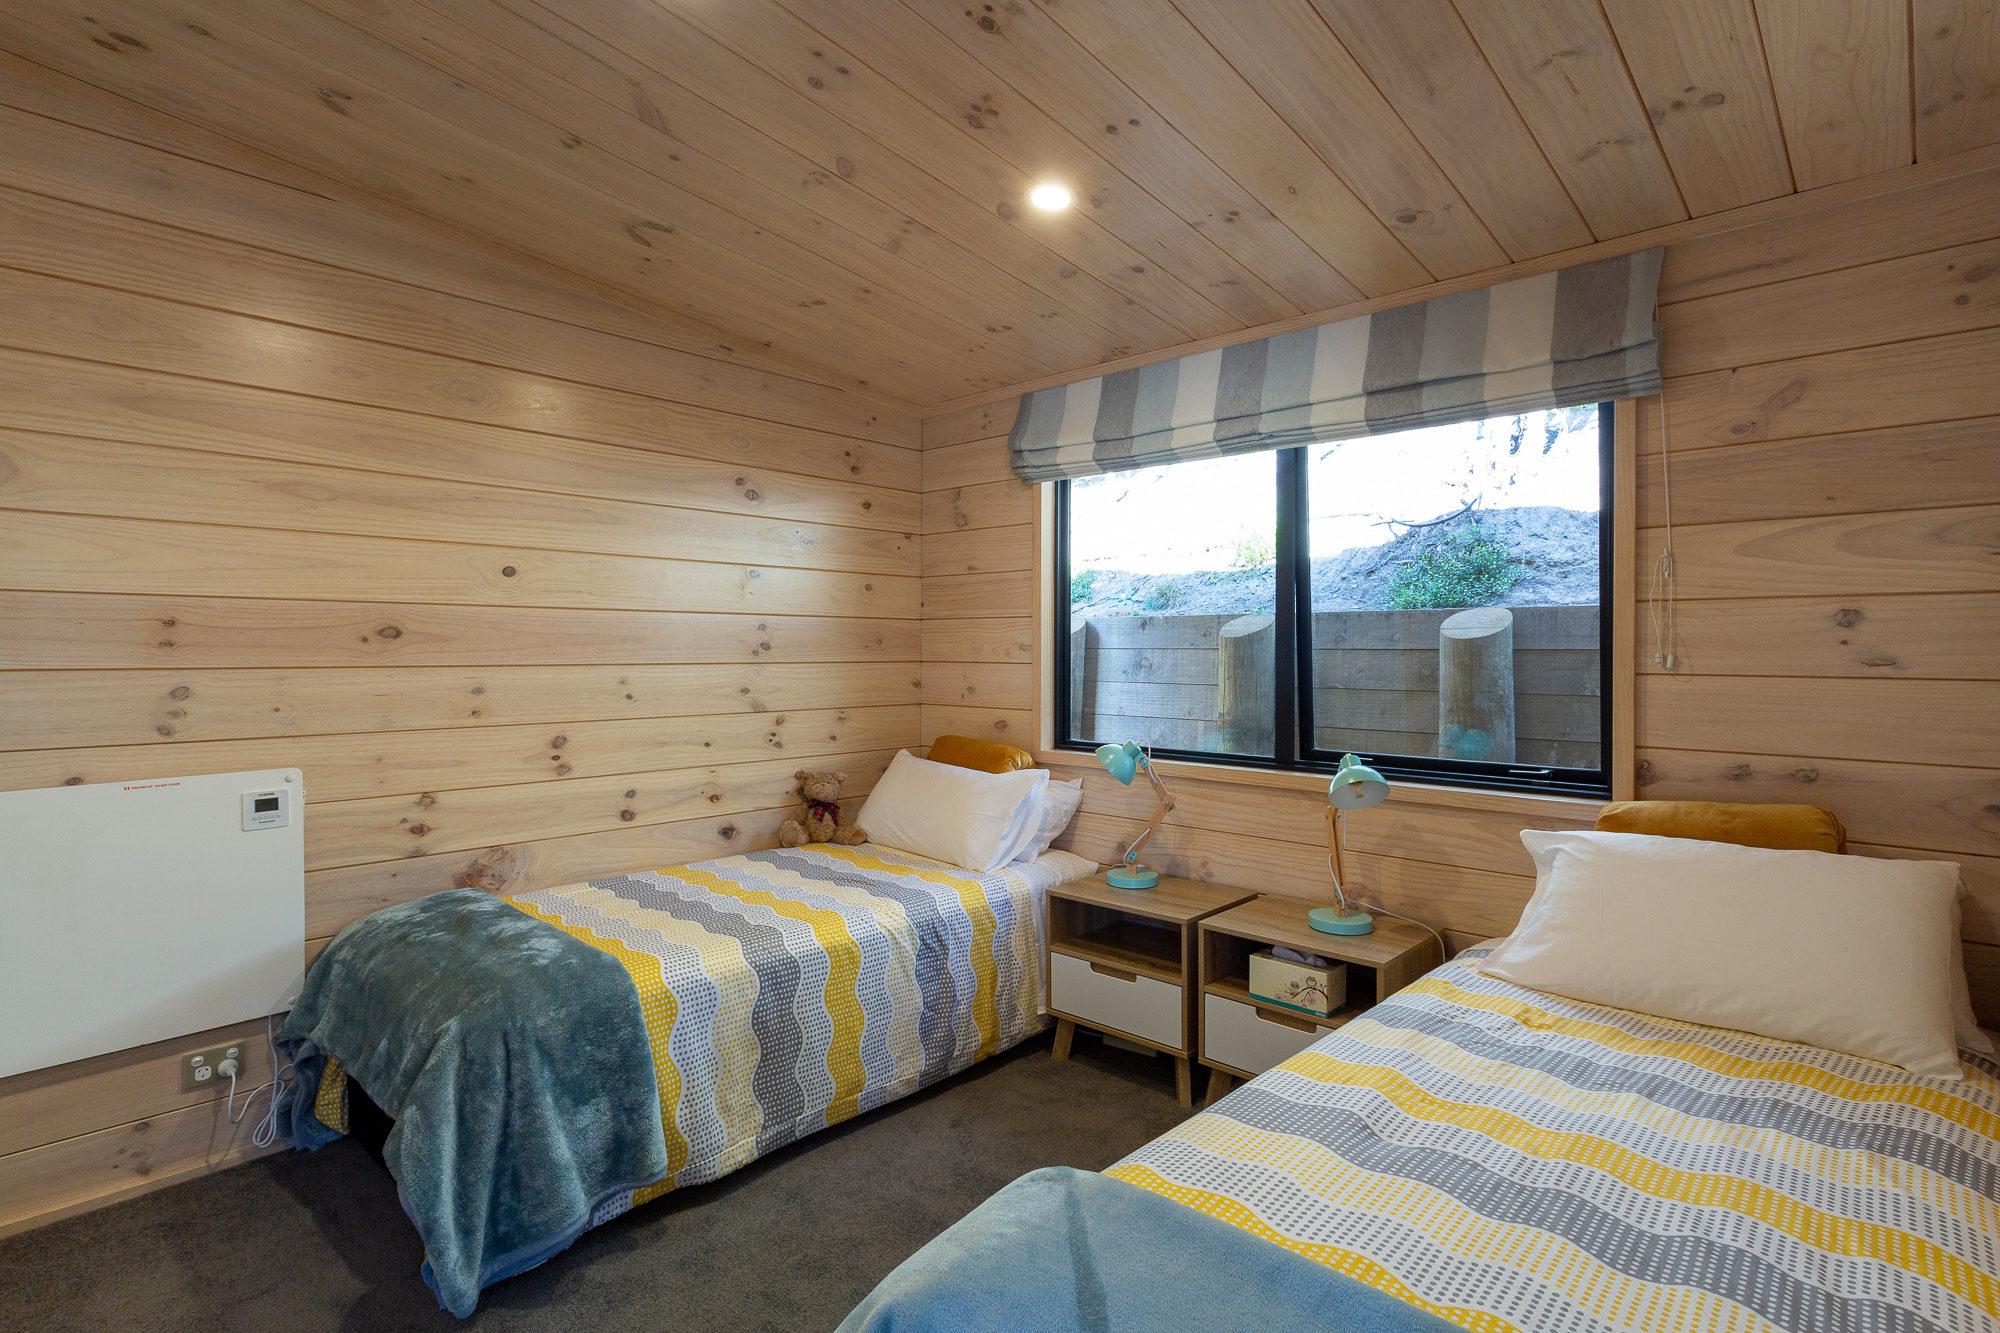 Second bedroom in Lockwood ReadyBuilt holiday accommodation